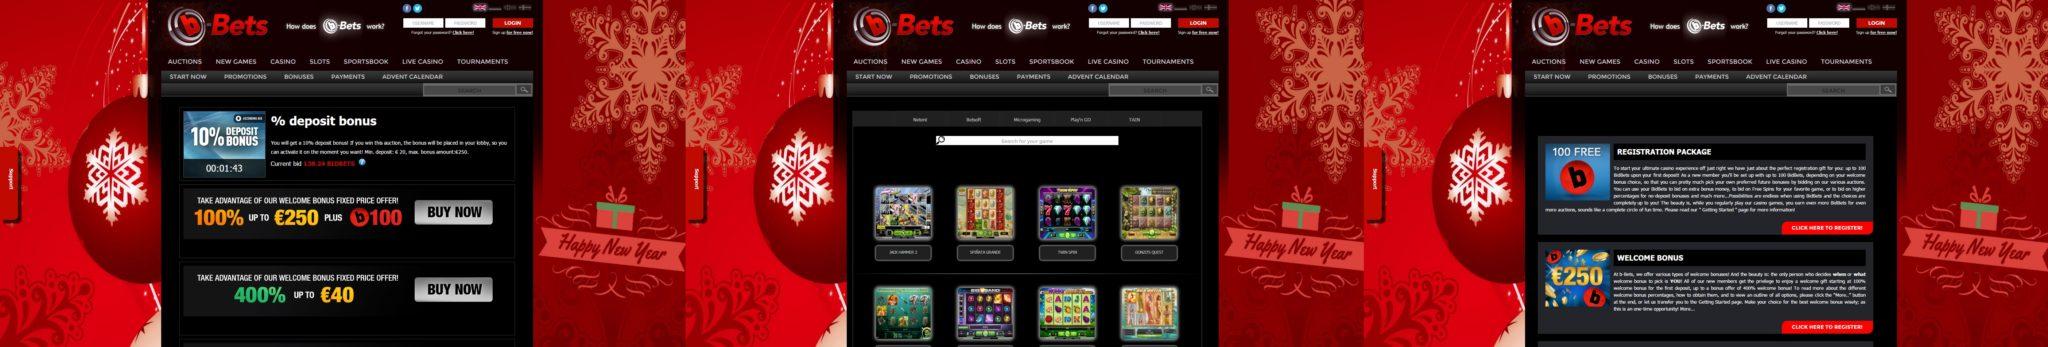 b-Bets screens